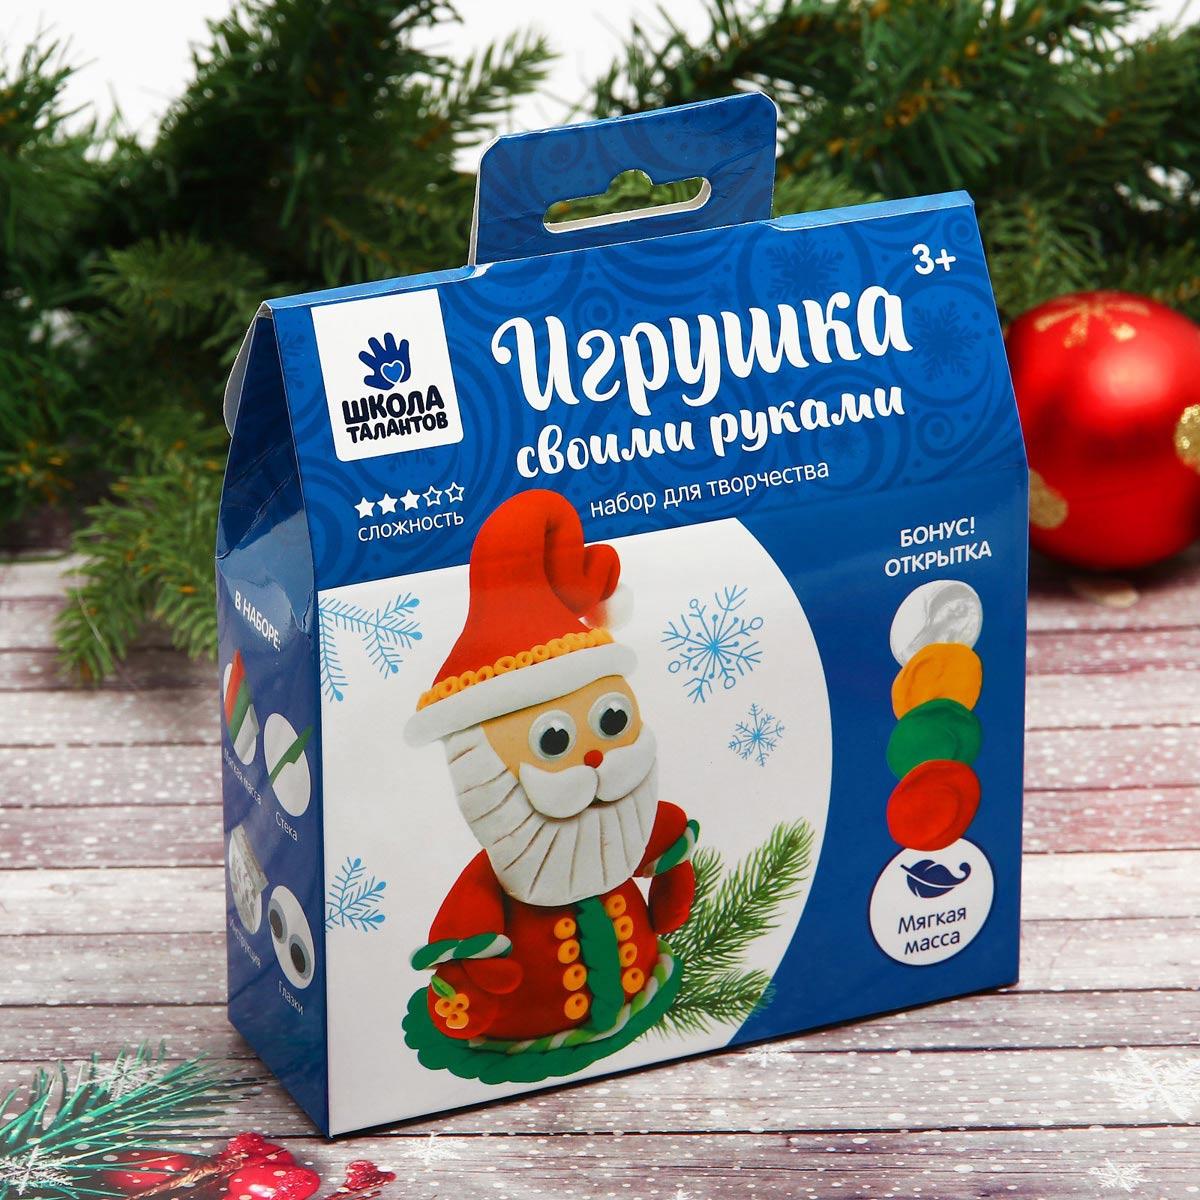 2366505 Набор для творчества 'Игрушка своими руками 'Дед Мороз'